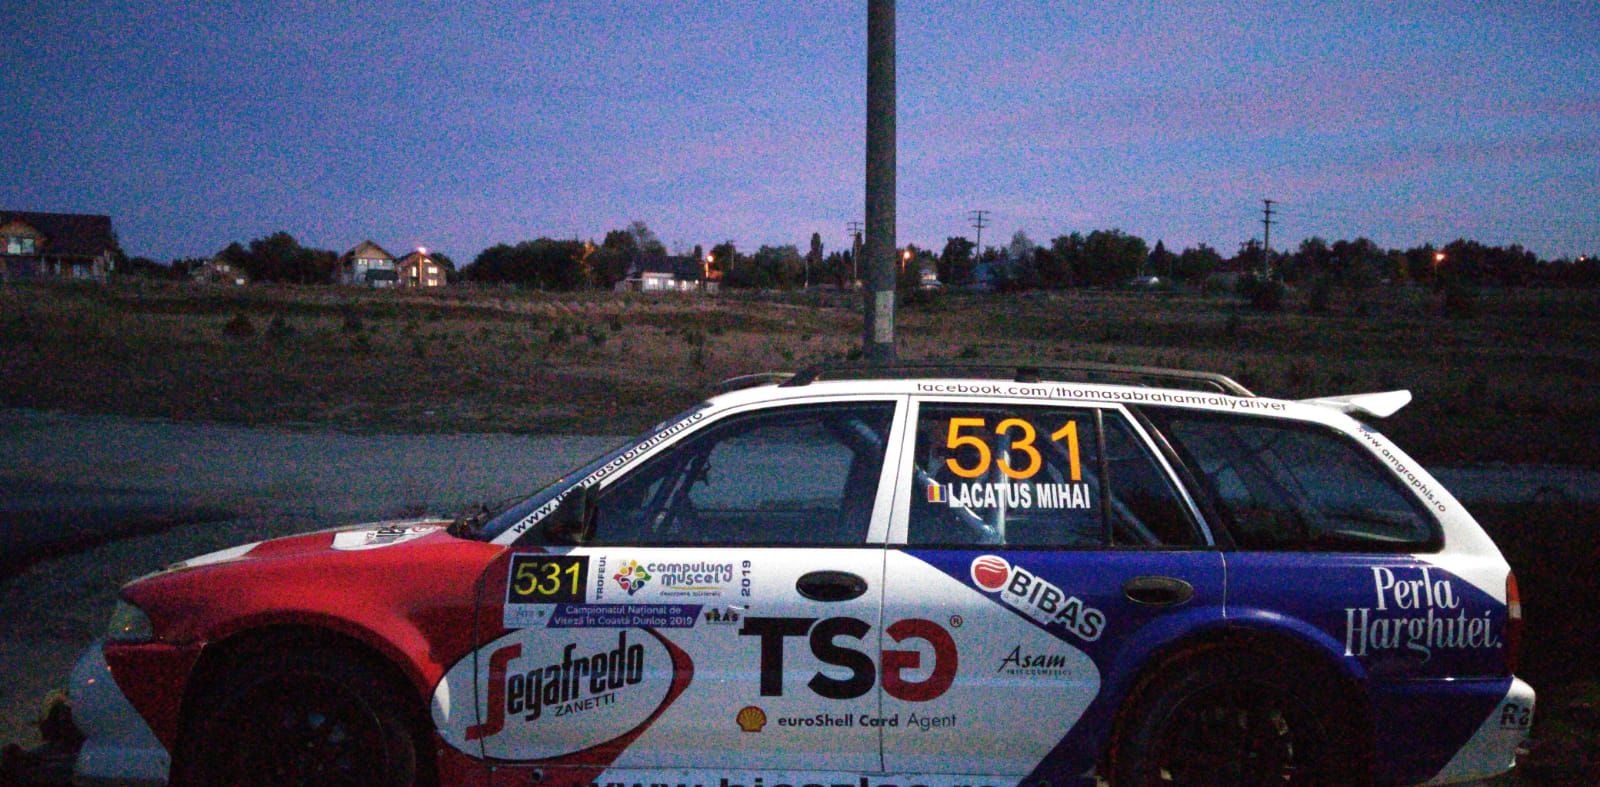 Mihai Lacatus ia startul cu Mitsubishi Lancer Kombi in Trofeul Campulung Muscel